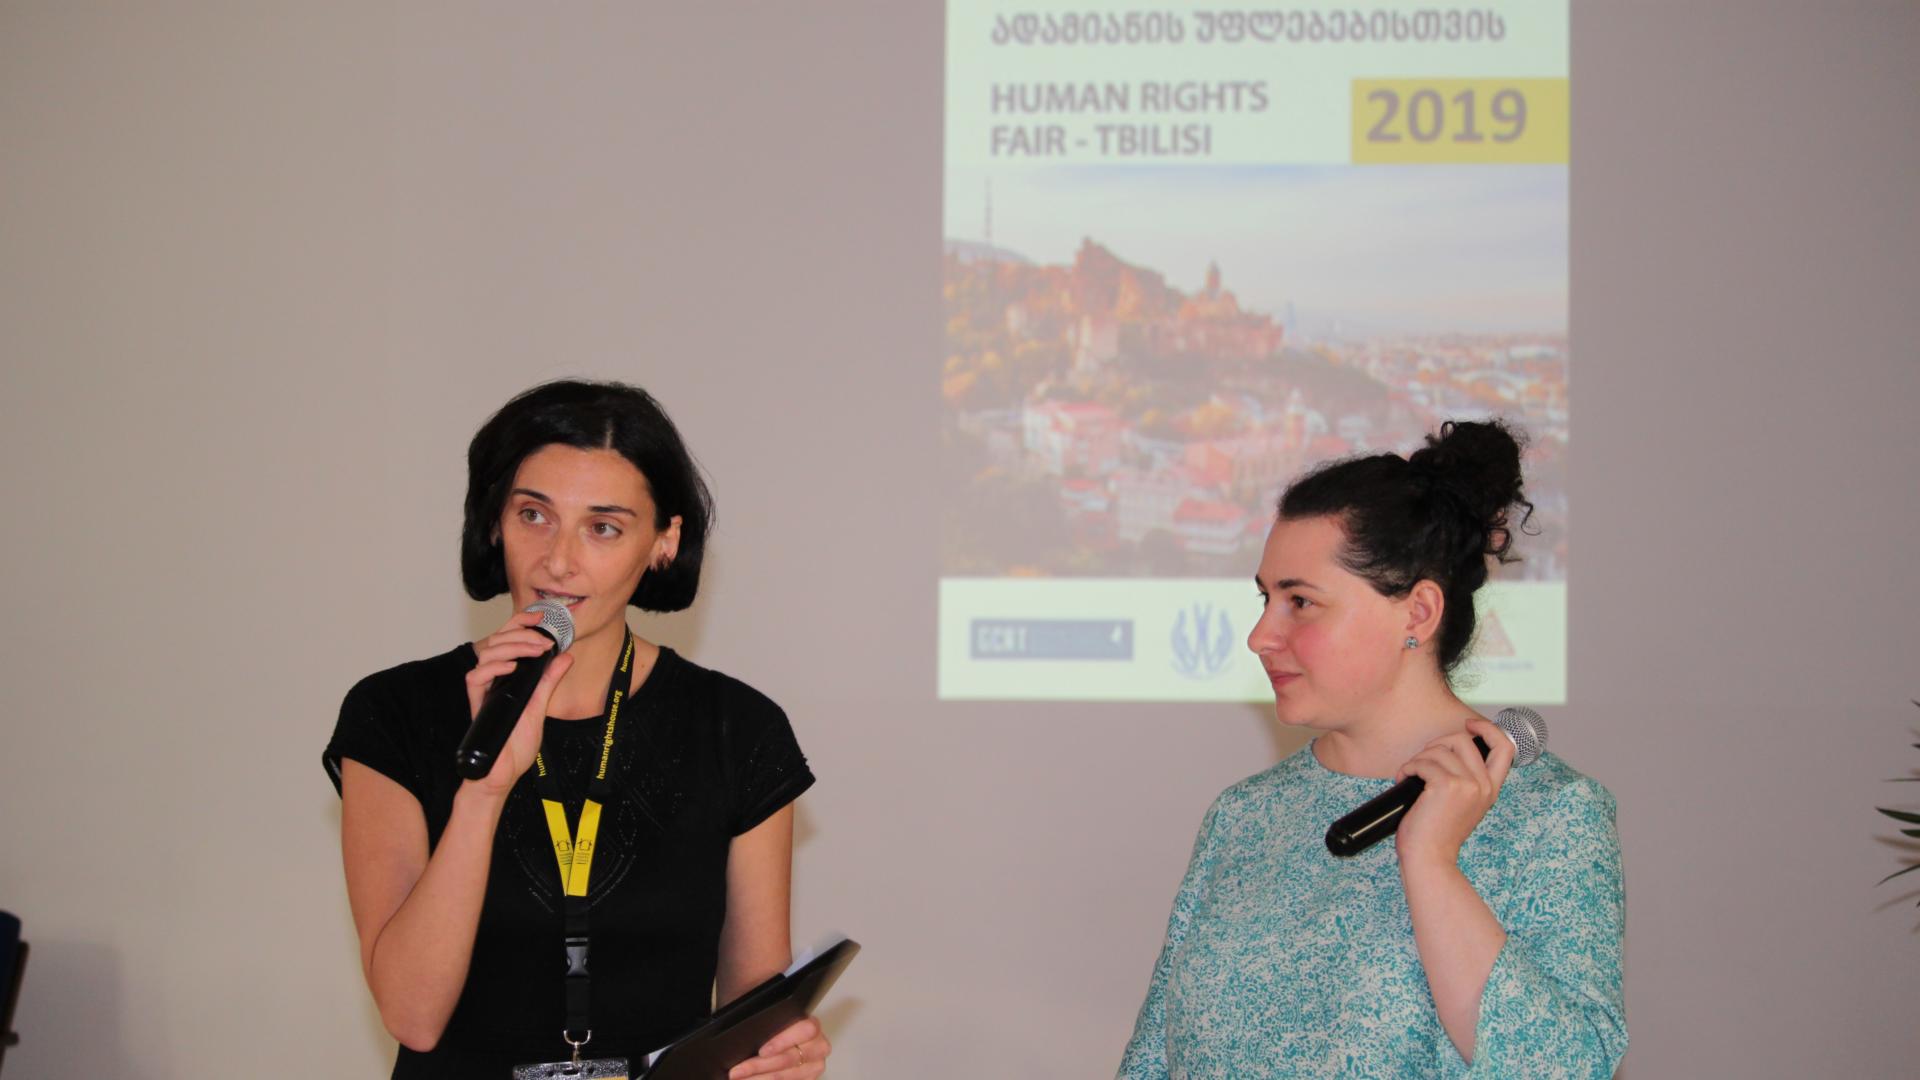 Coordinator of Human Rights House Tbilisi, Natia Tavberidze, speaking at Human Rights Fair Tbilisi 2019